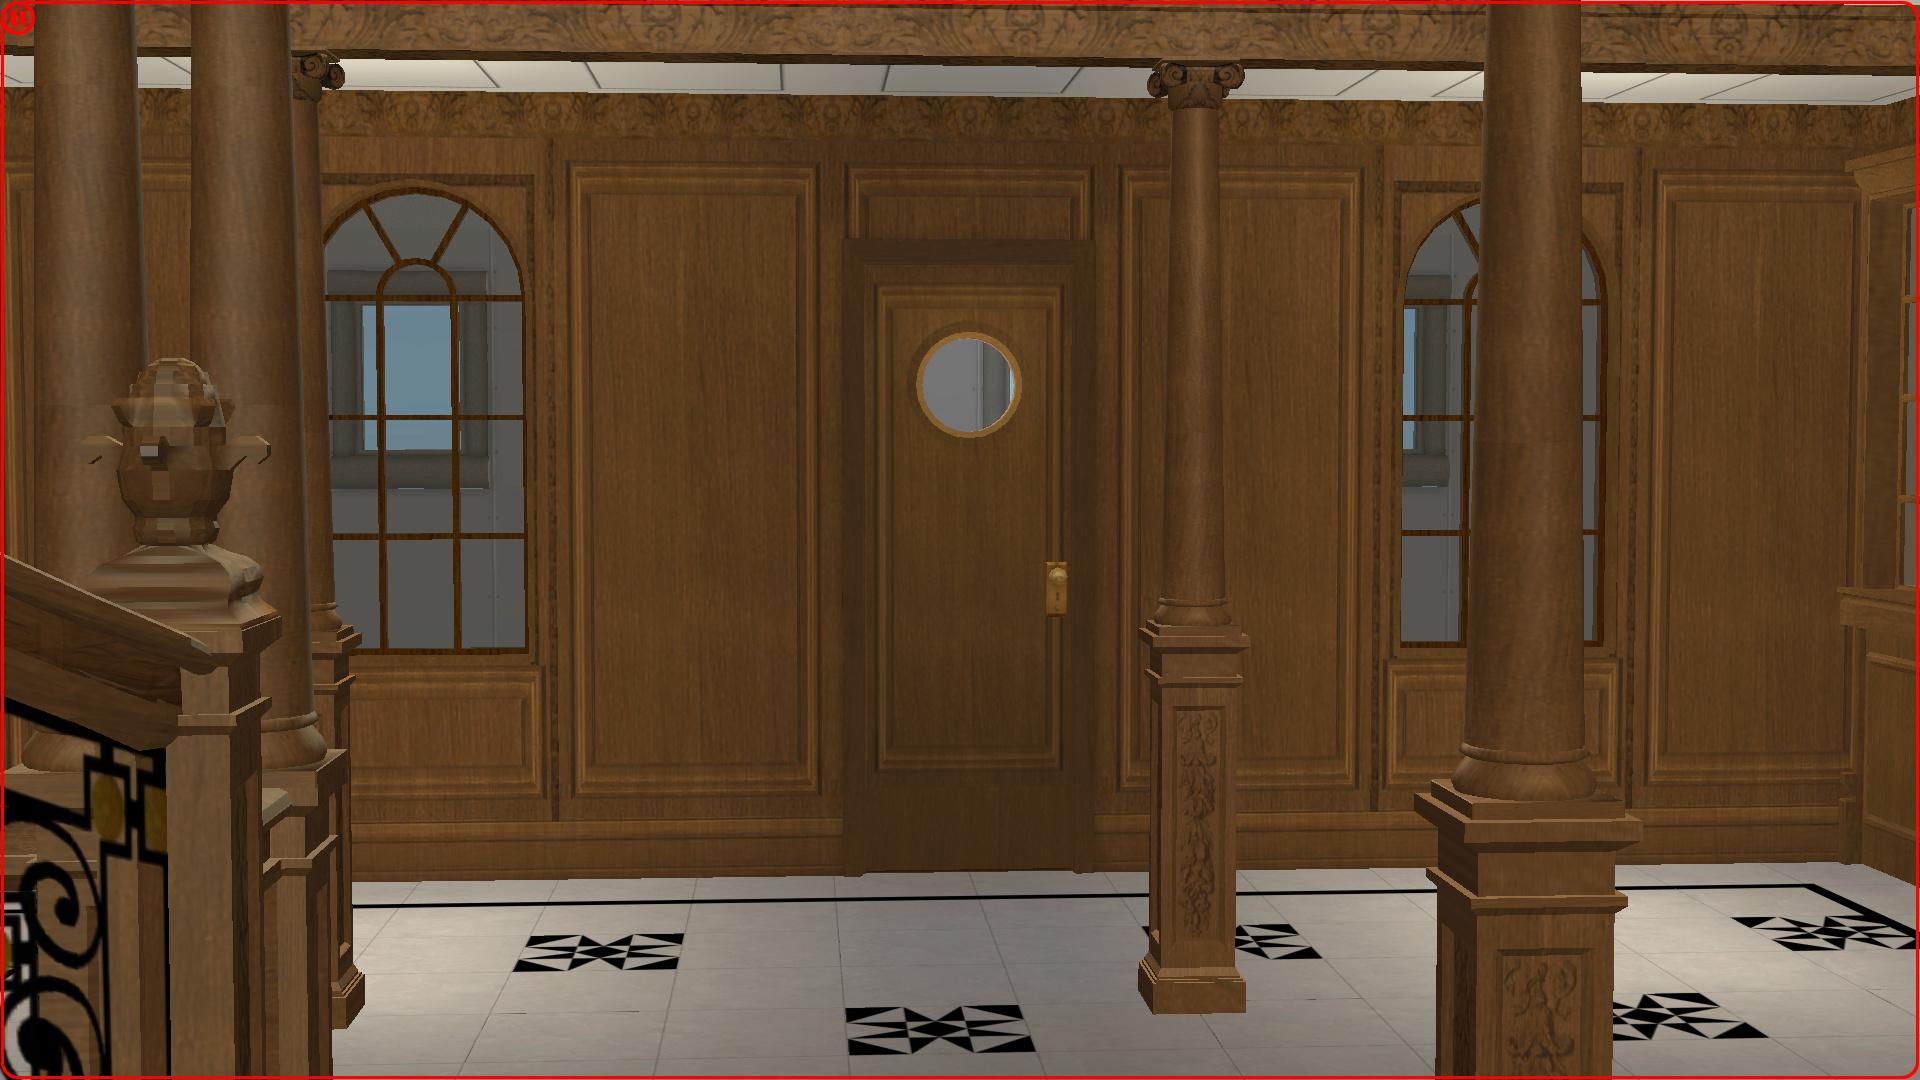 The Sims 2 Titanic Sims2e63